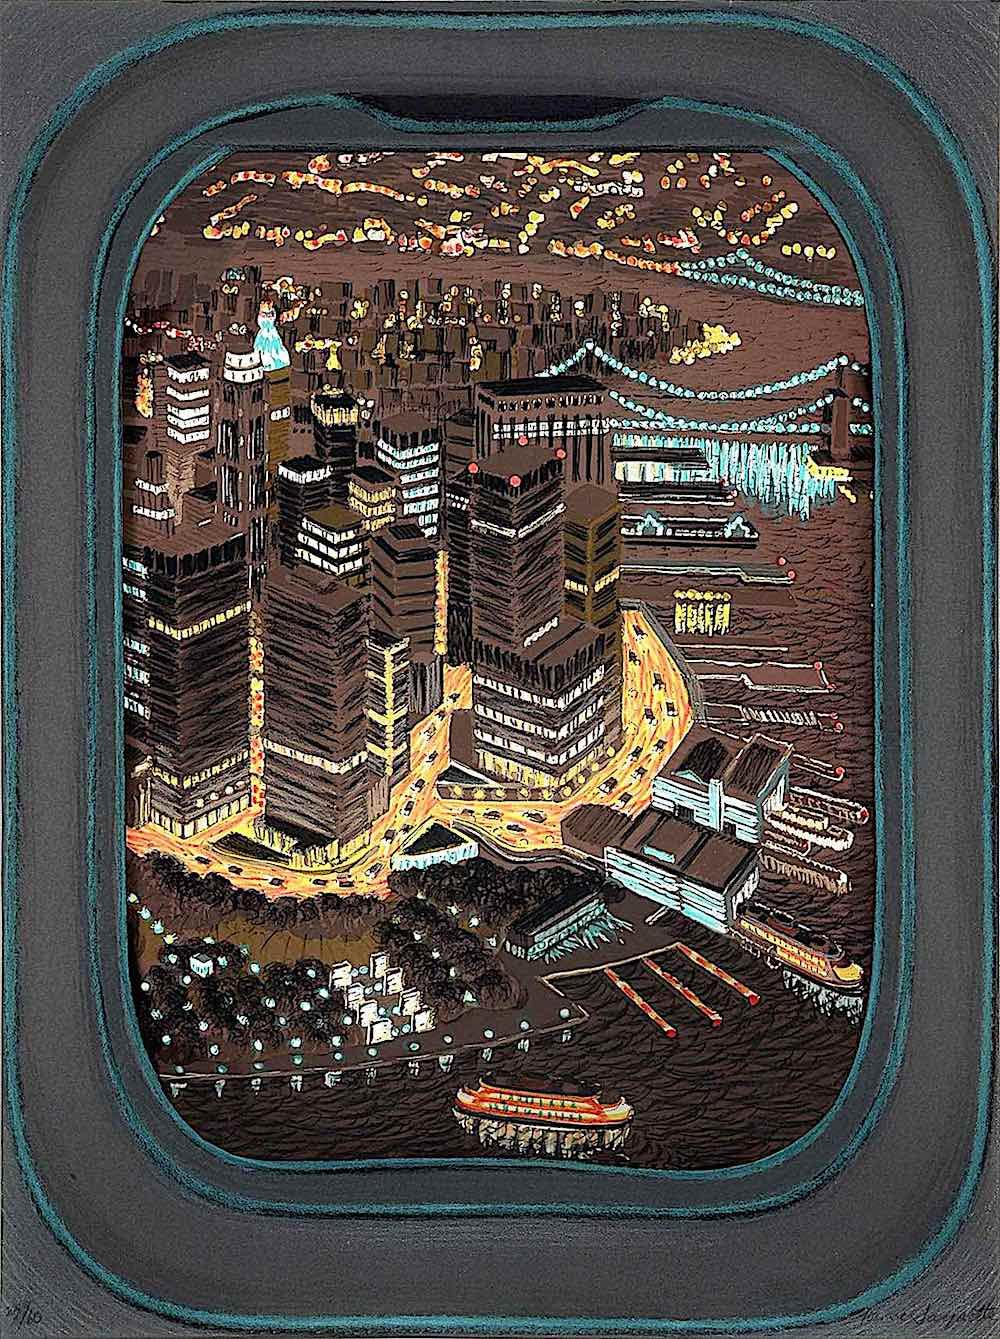 Yvonne Jacquette art, a city at night seen through a passenger jet window